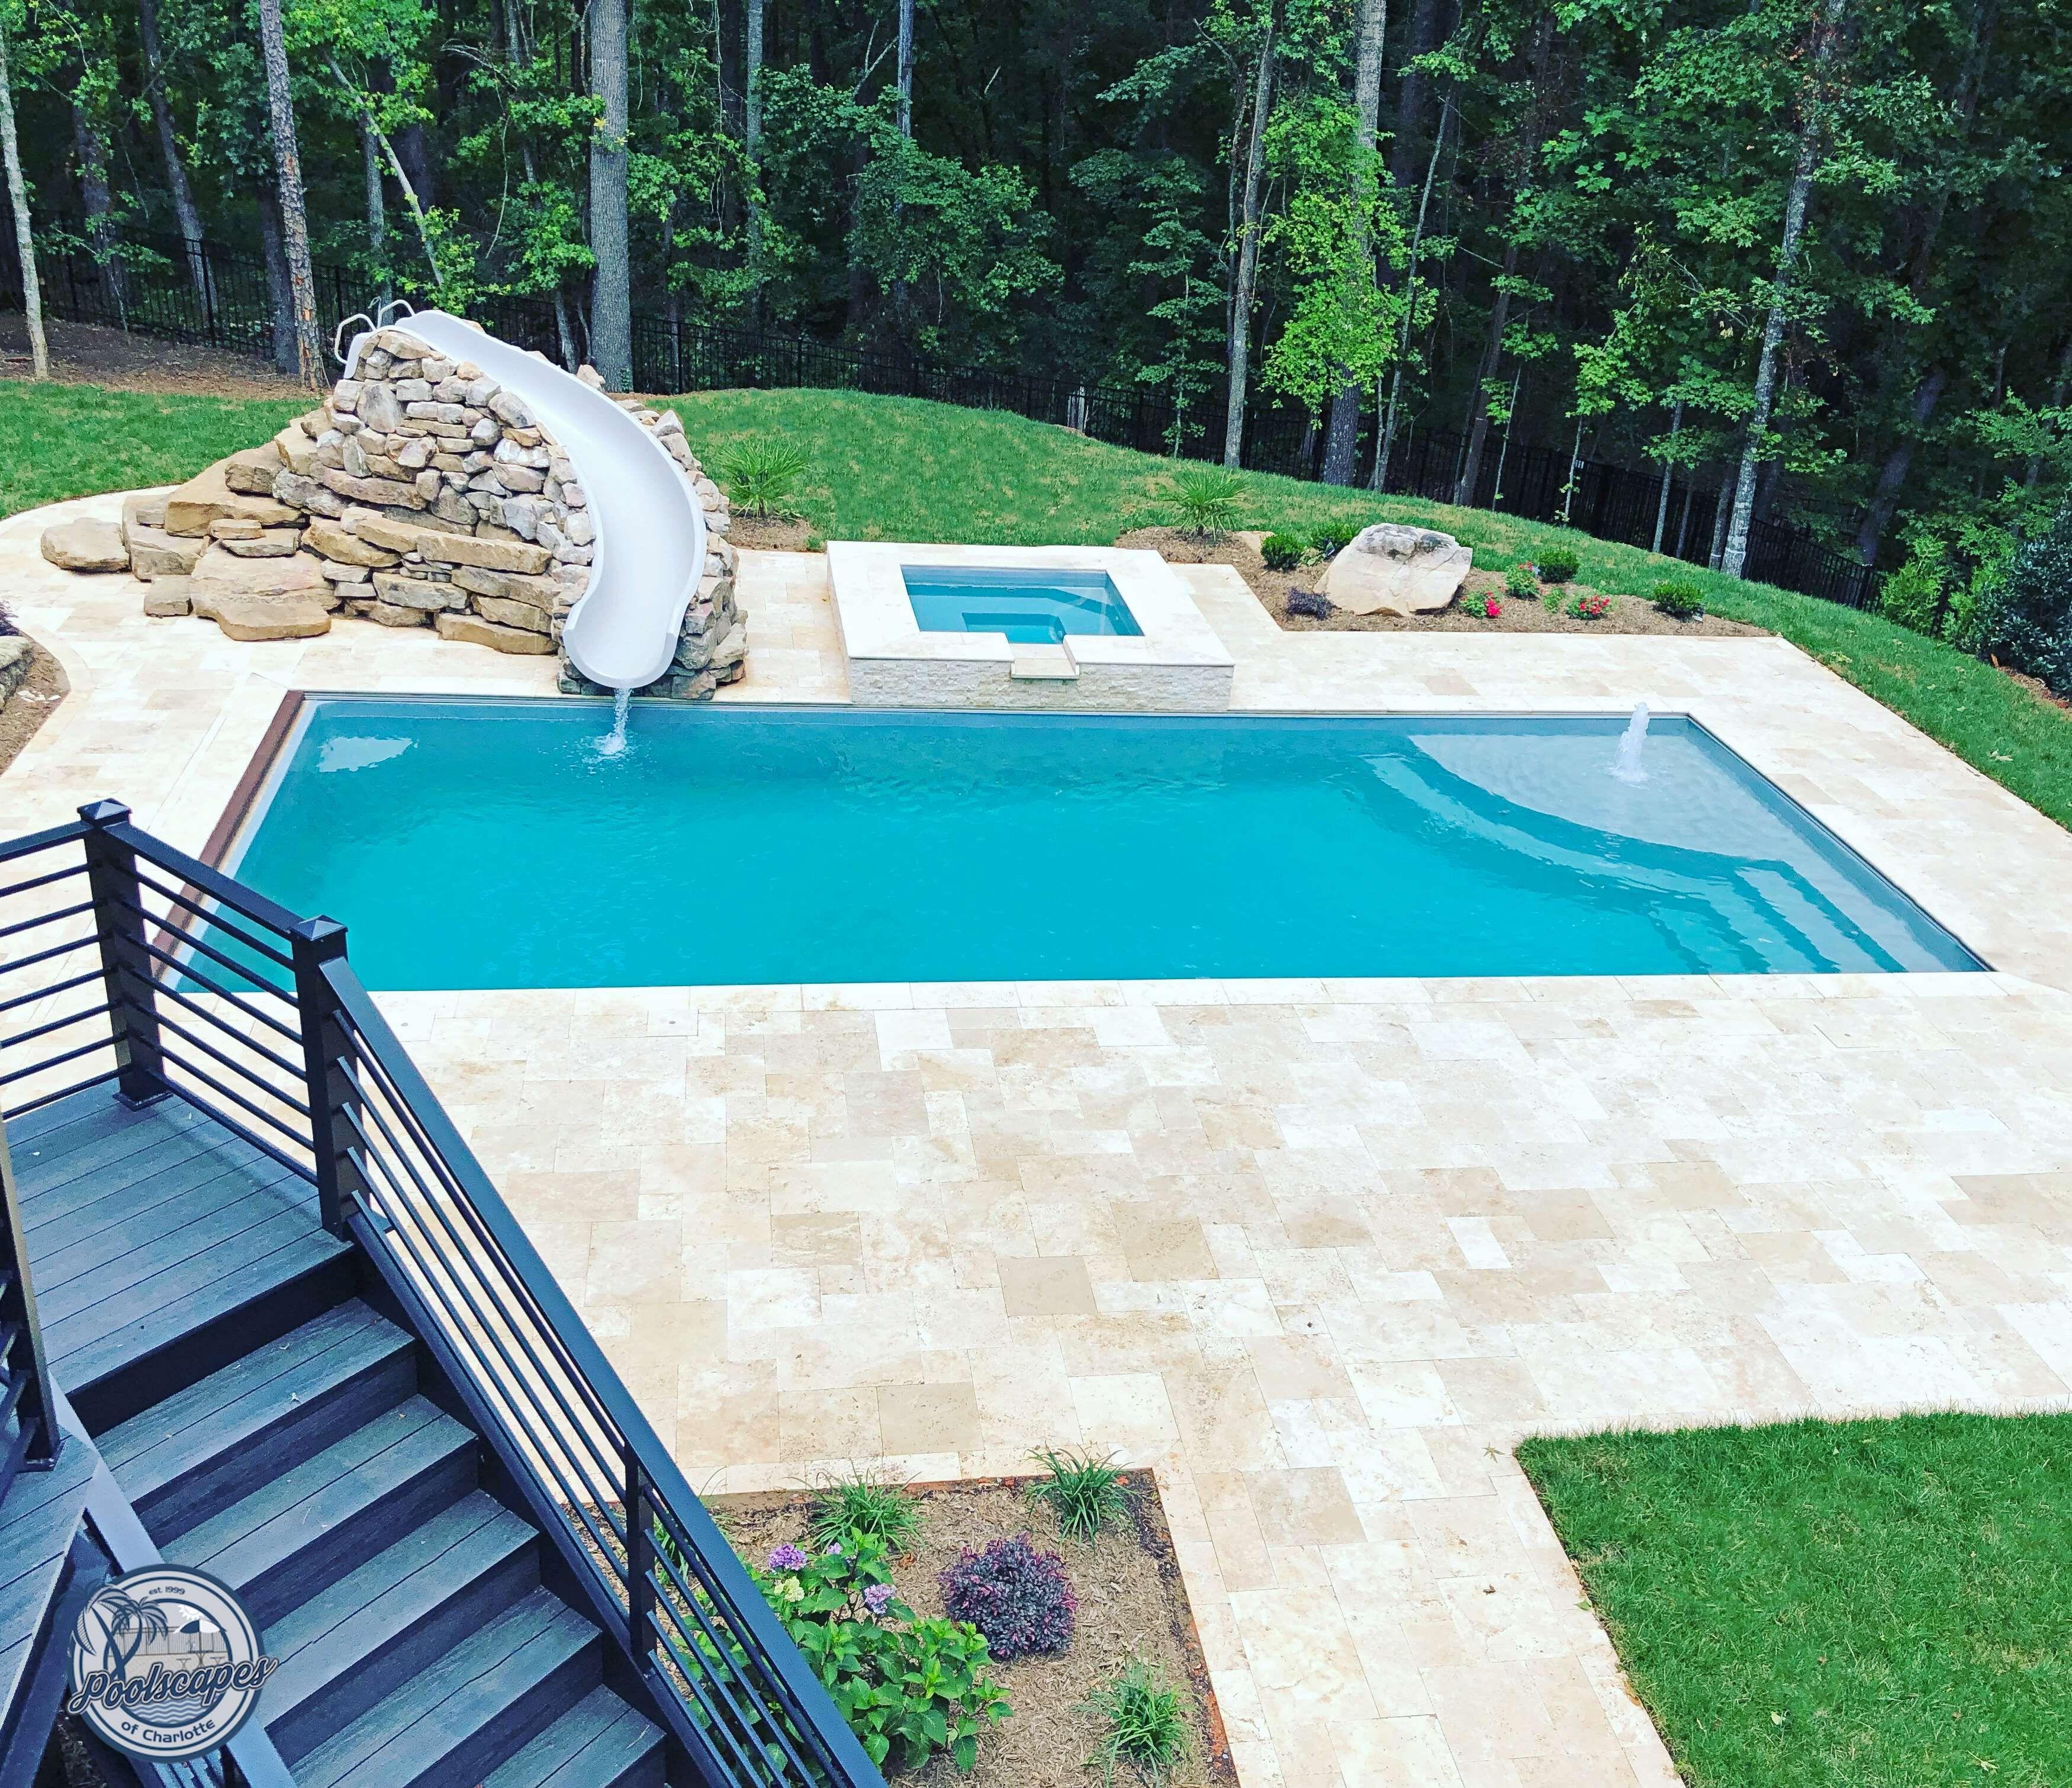 The Great Lakes In Your Backyard Pools Backyard Inground Travertine Pool Swimming Pools Backyard